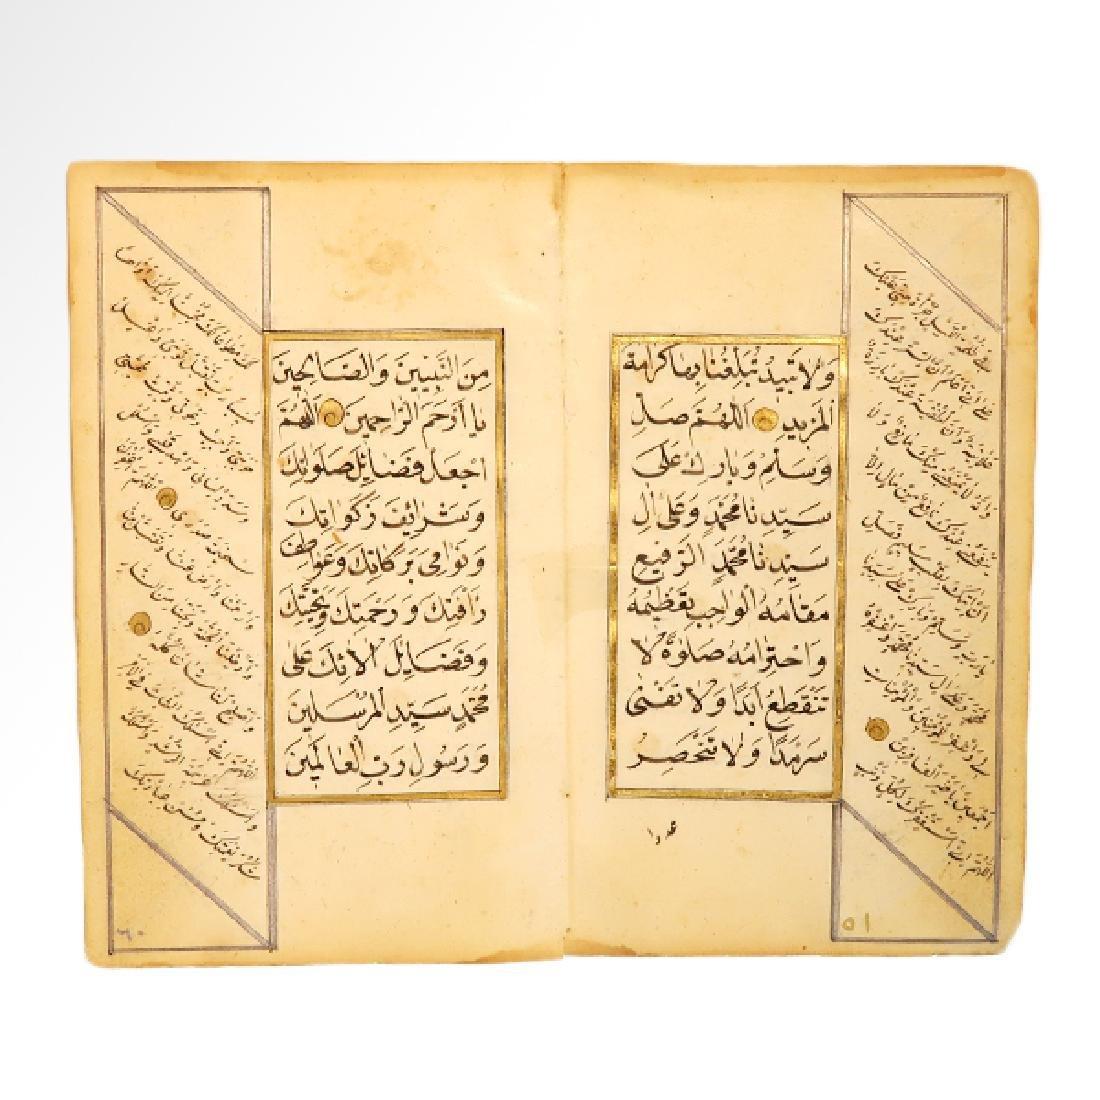 Arabic Illuminated/Gilt Manuscript, Near East, c. 16th - 5